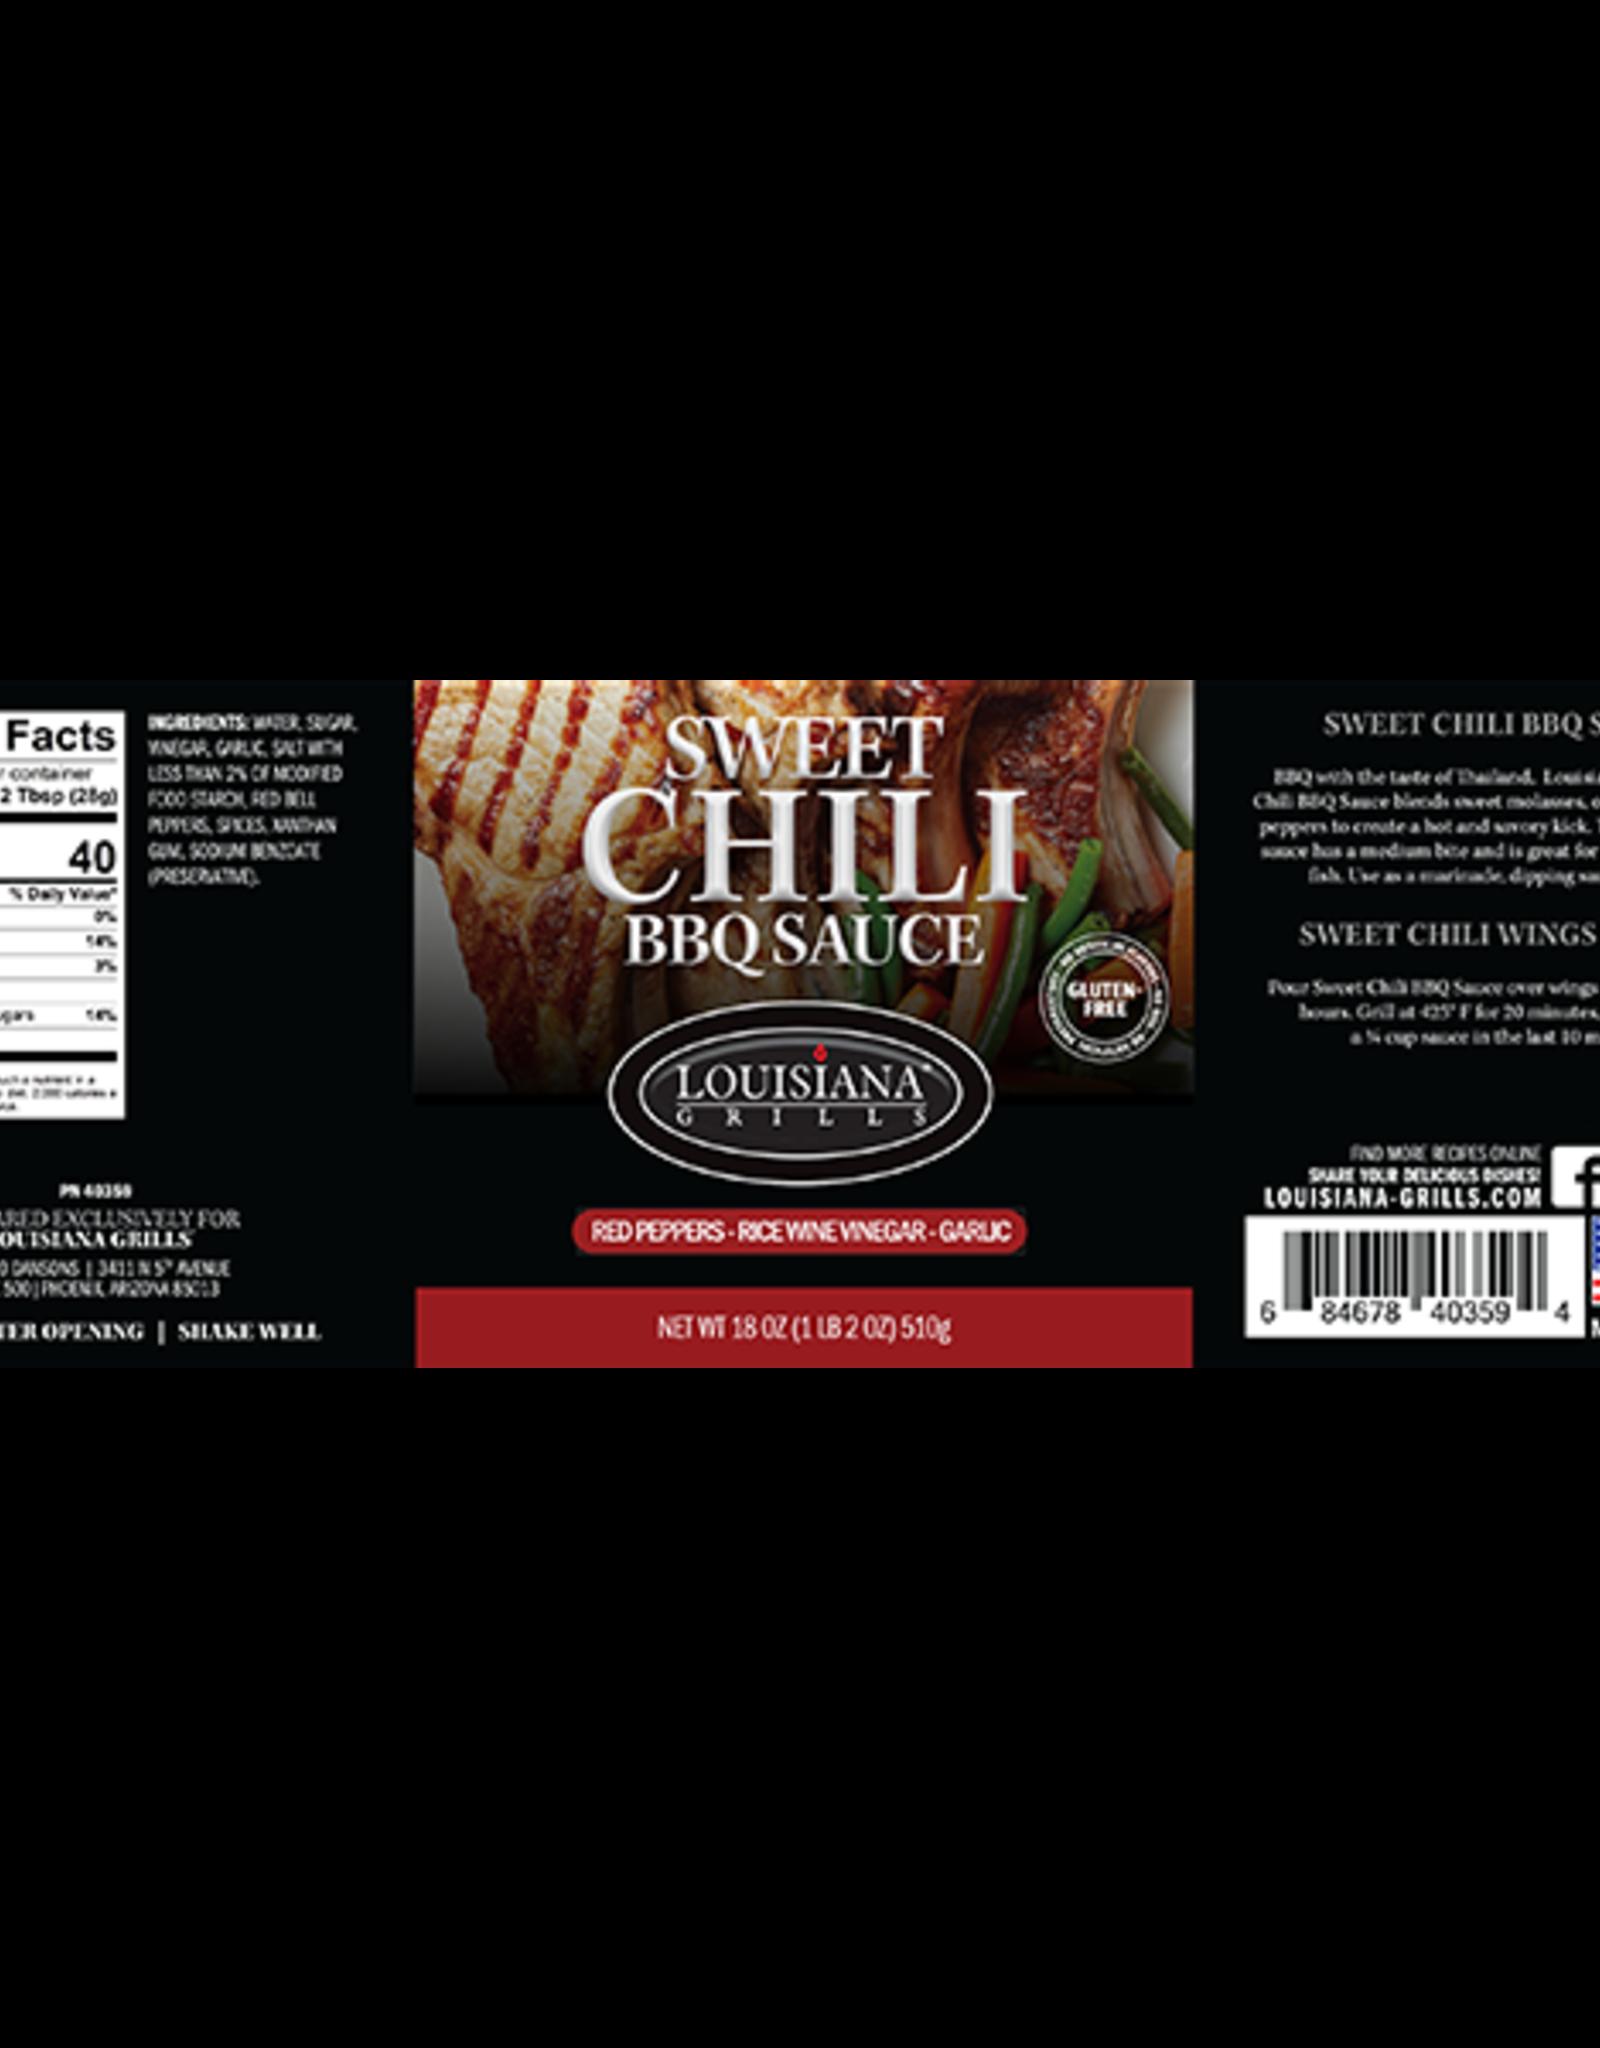 LOUISIANA LOUISIANA BBQ SAUCES AND GLAZES - SWEET CHILI